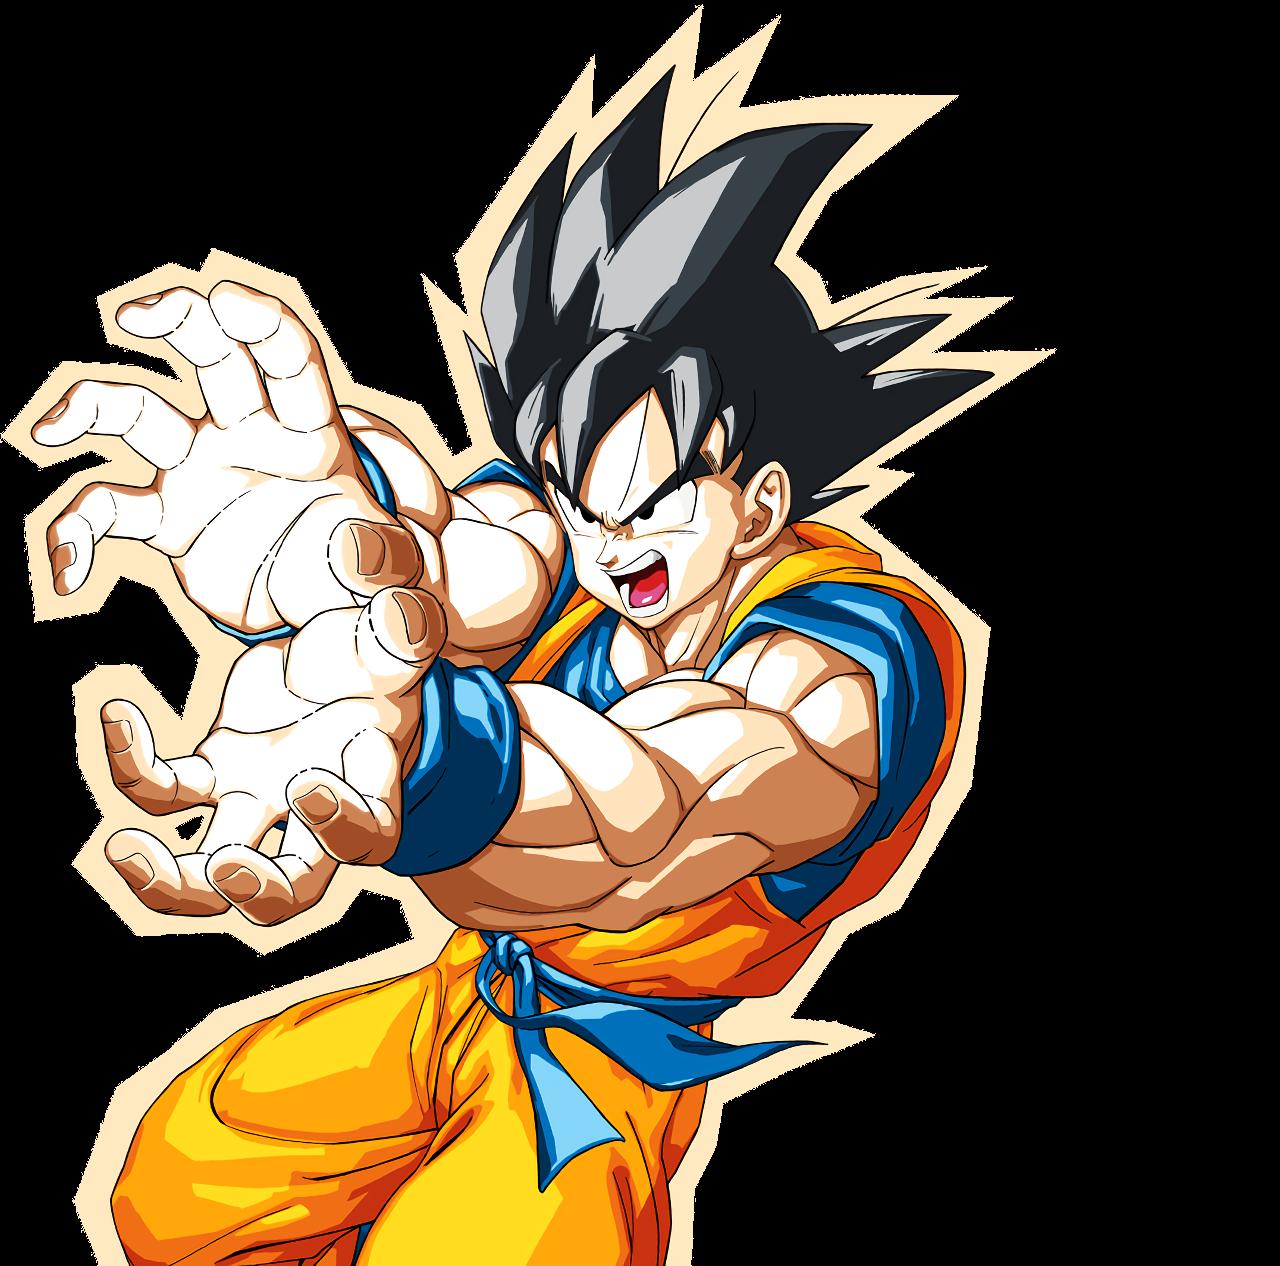 Son Goku Render 3 Dbz Kakarot By Maxiuchiha22 On Deviantart Dragon Ball Super Manga Dragon Ball Art Dragon Ball Artwork